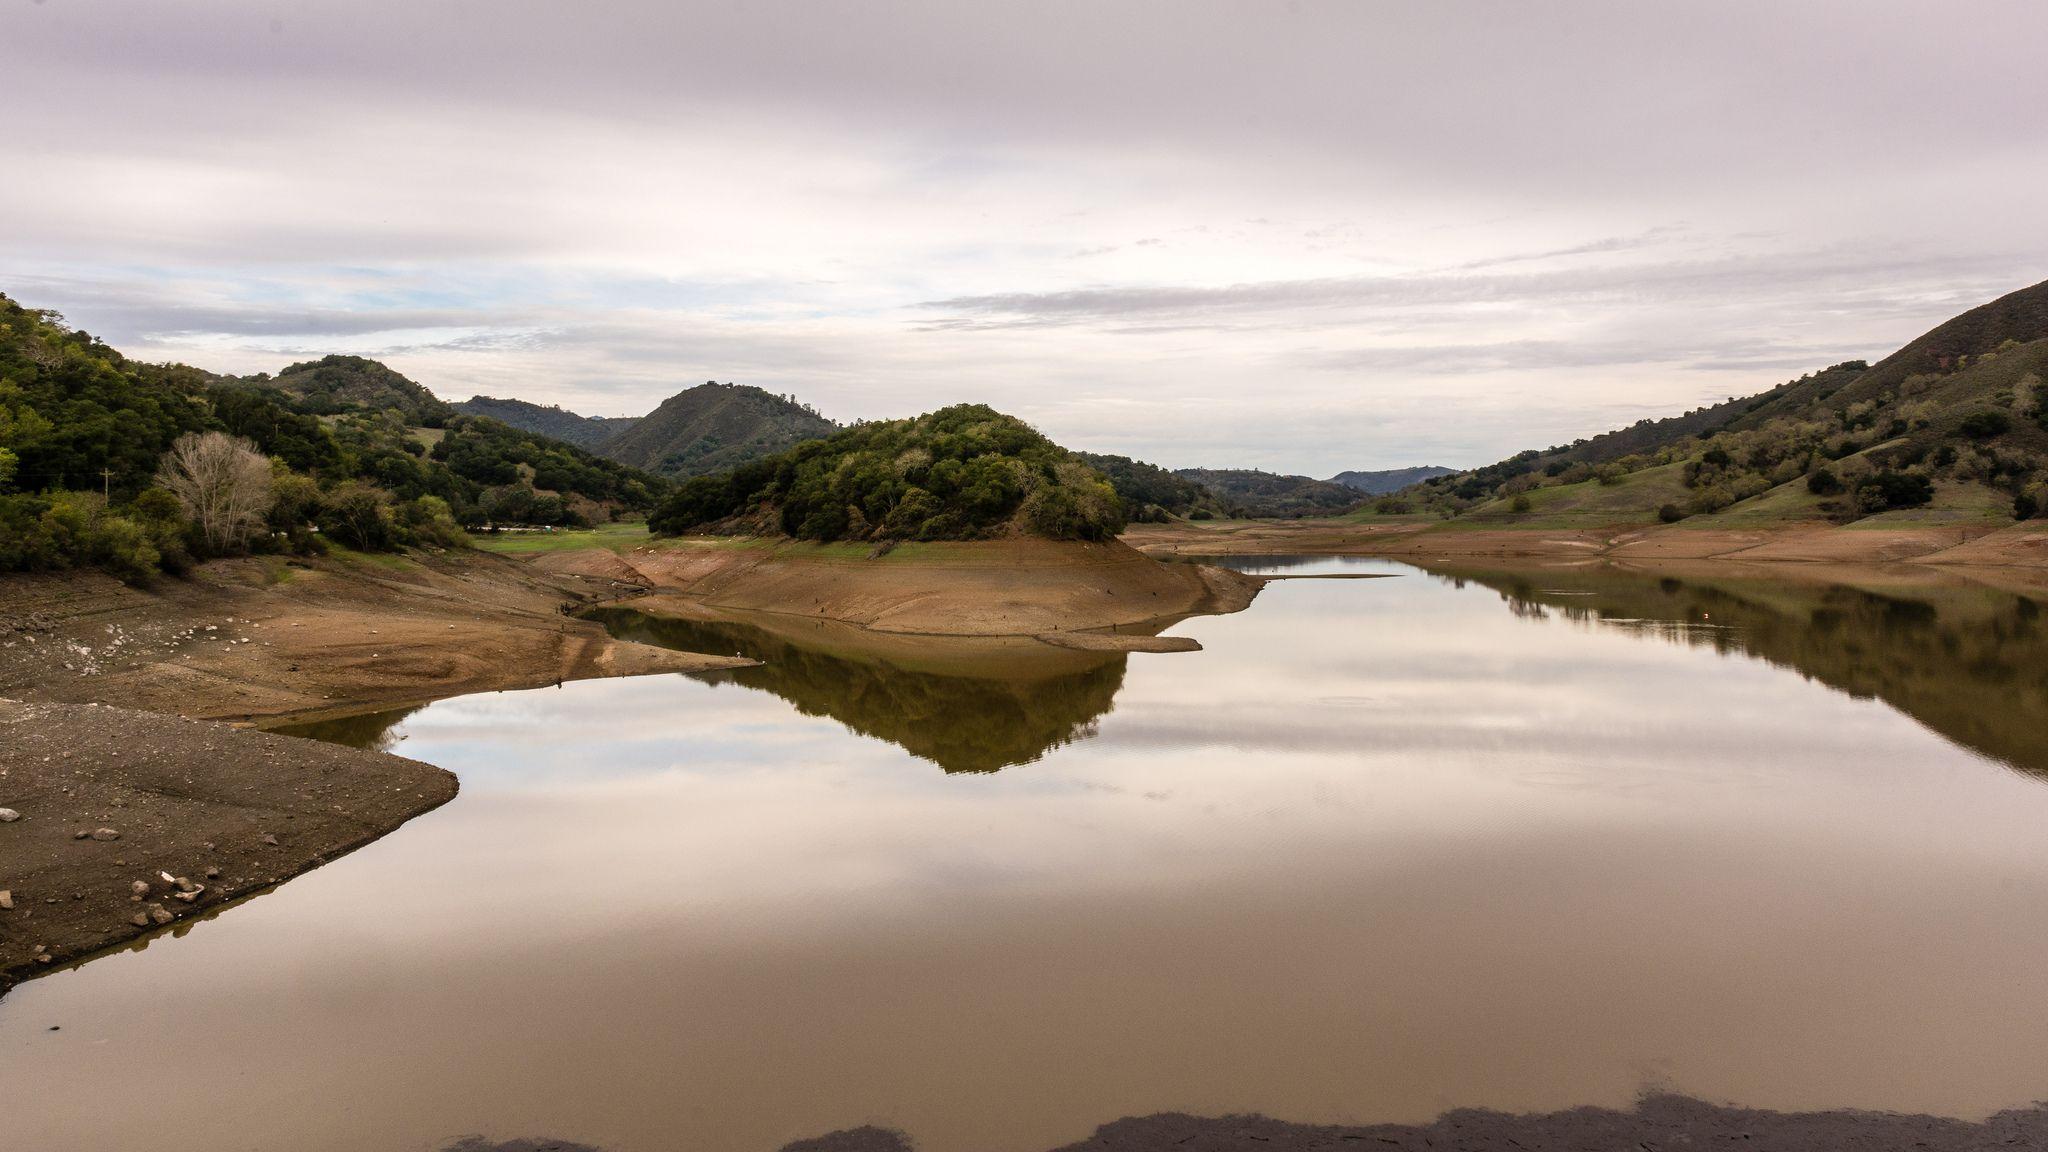 Uvas Reservoir, California Drought